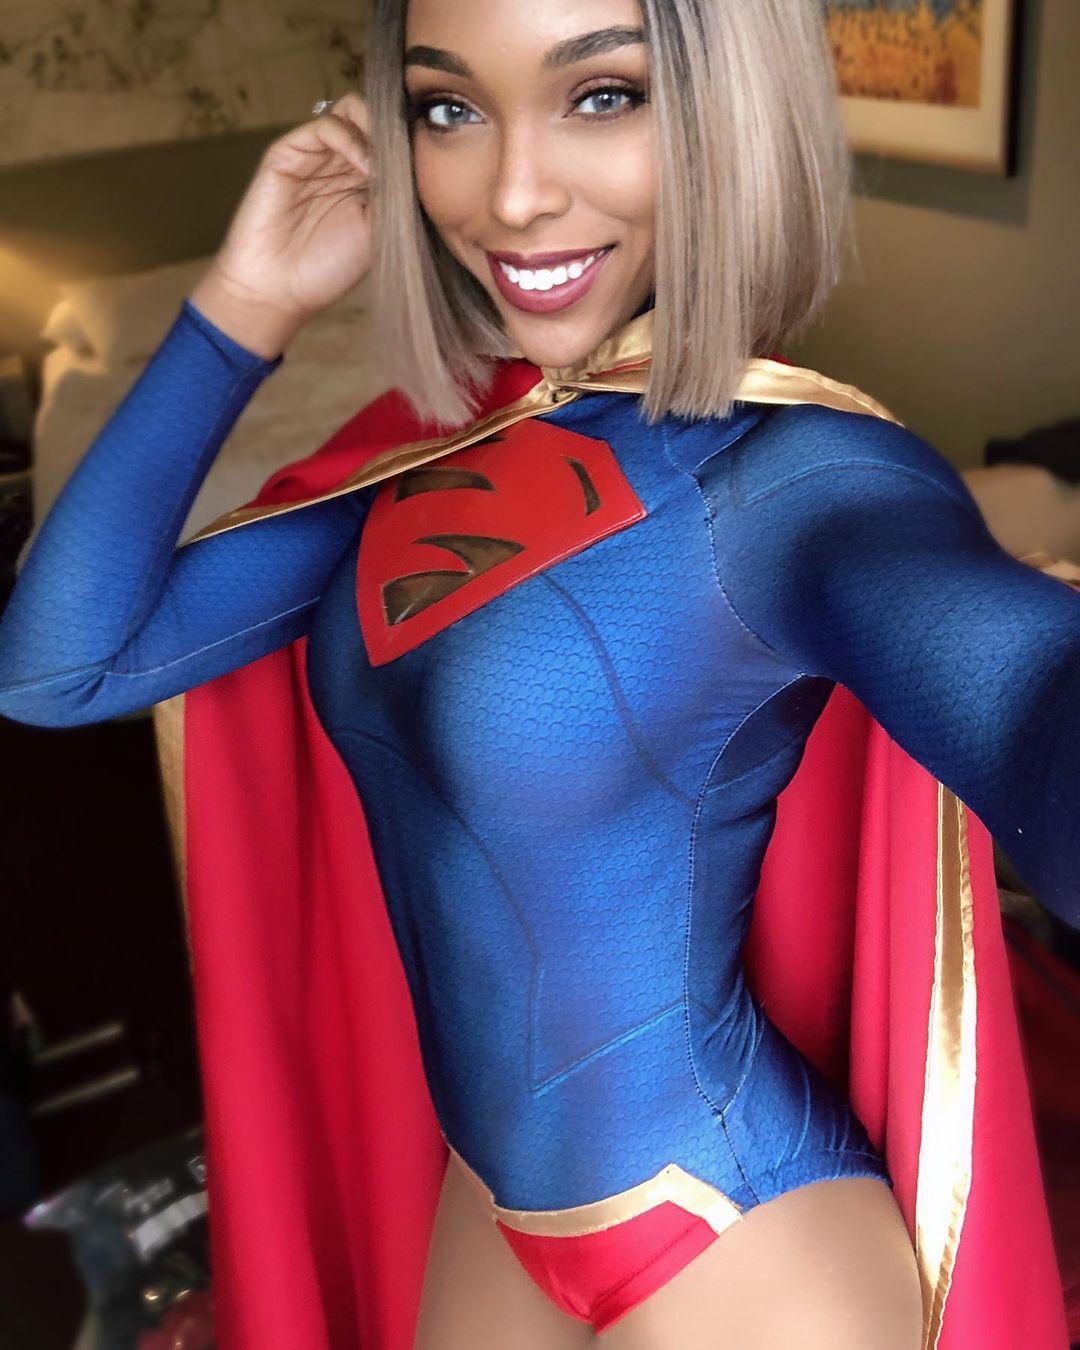 supergirl cosplay by CutiePieSensei